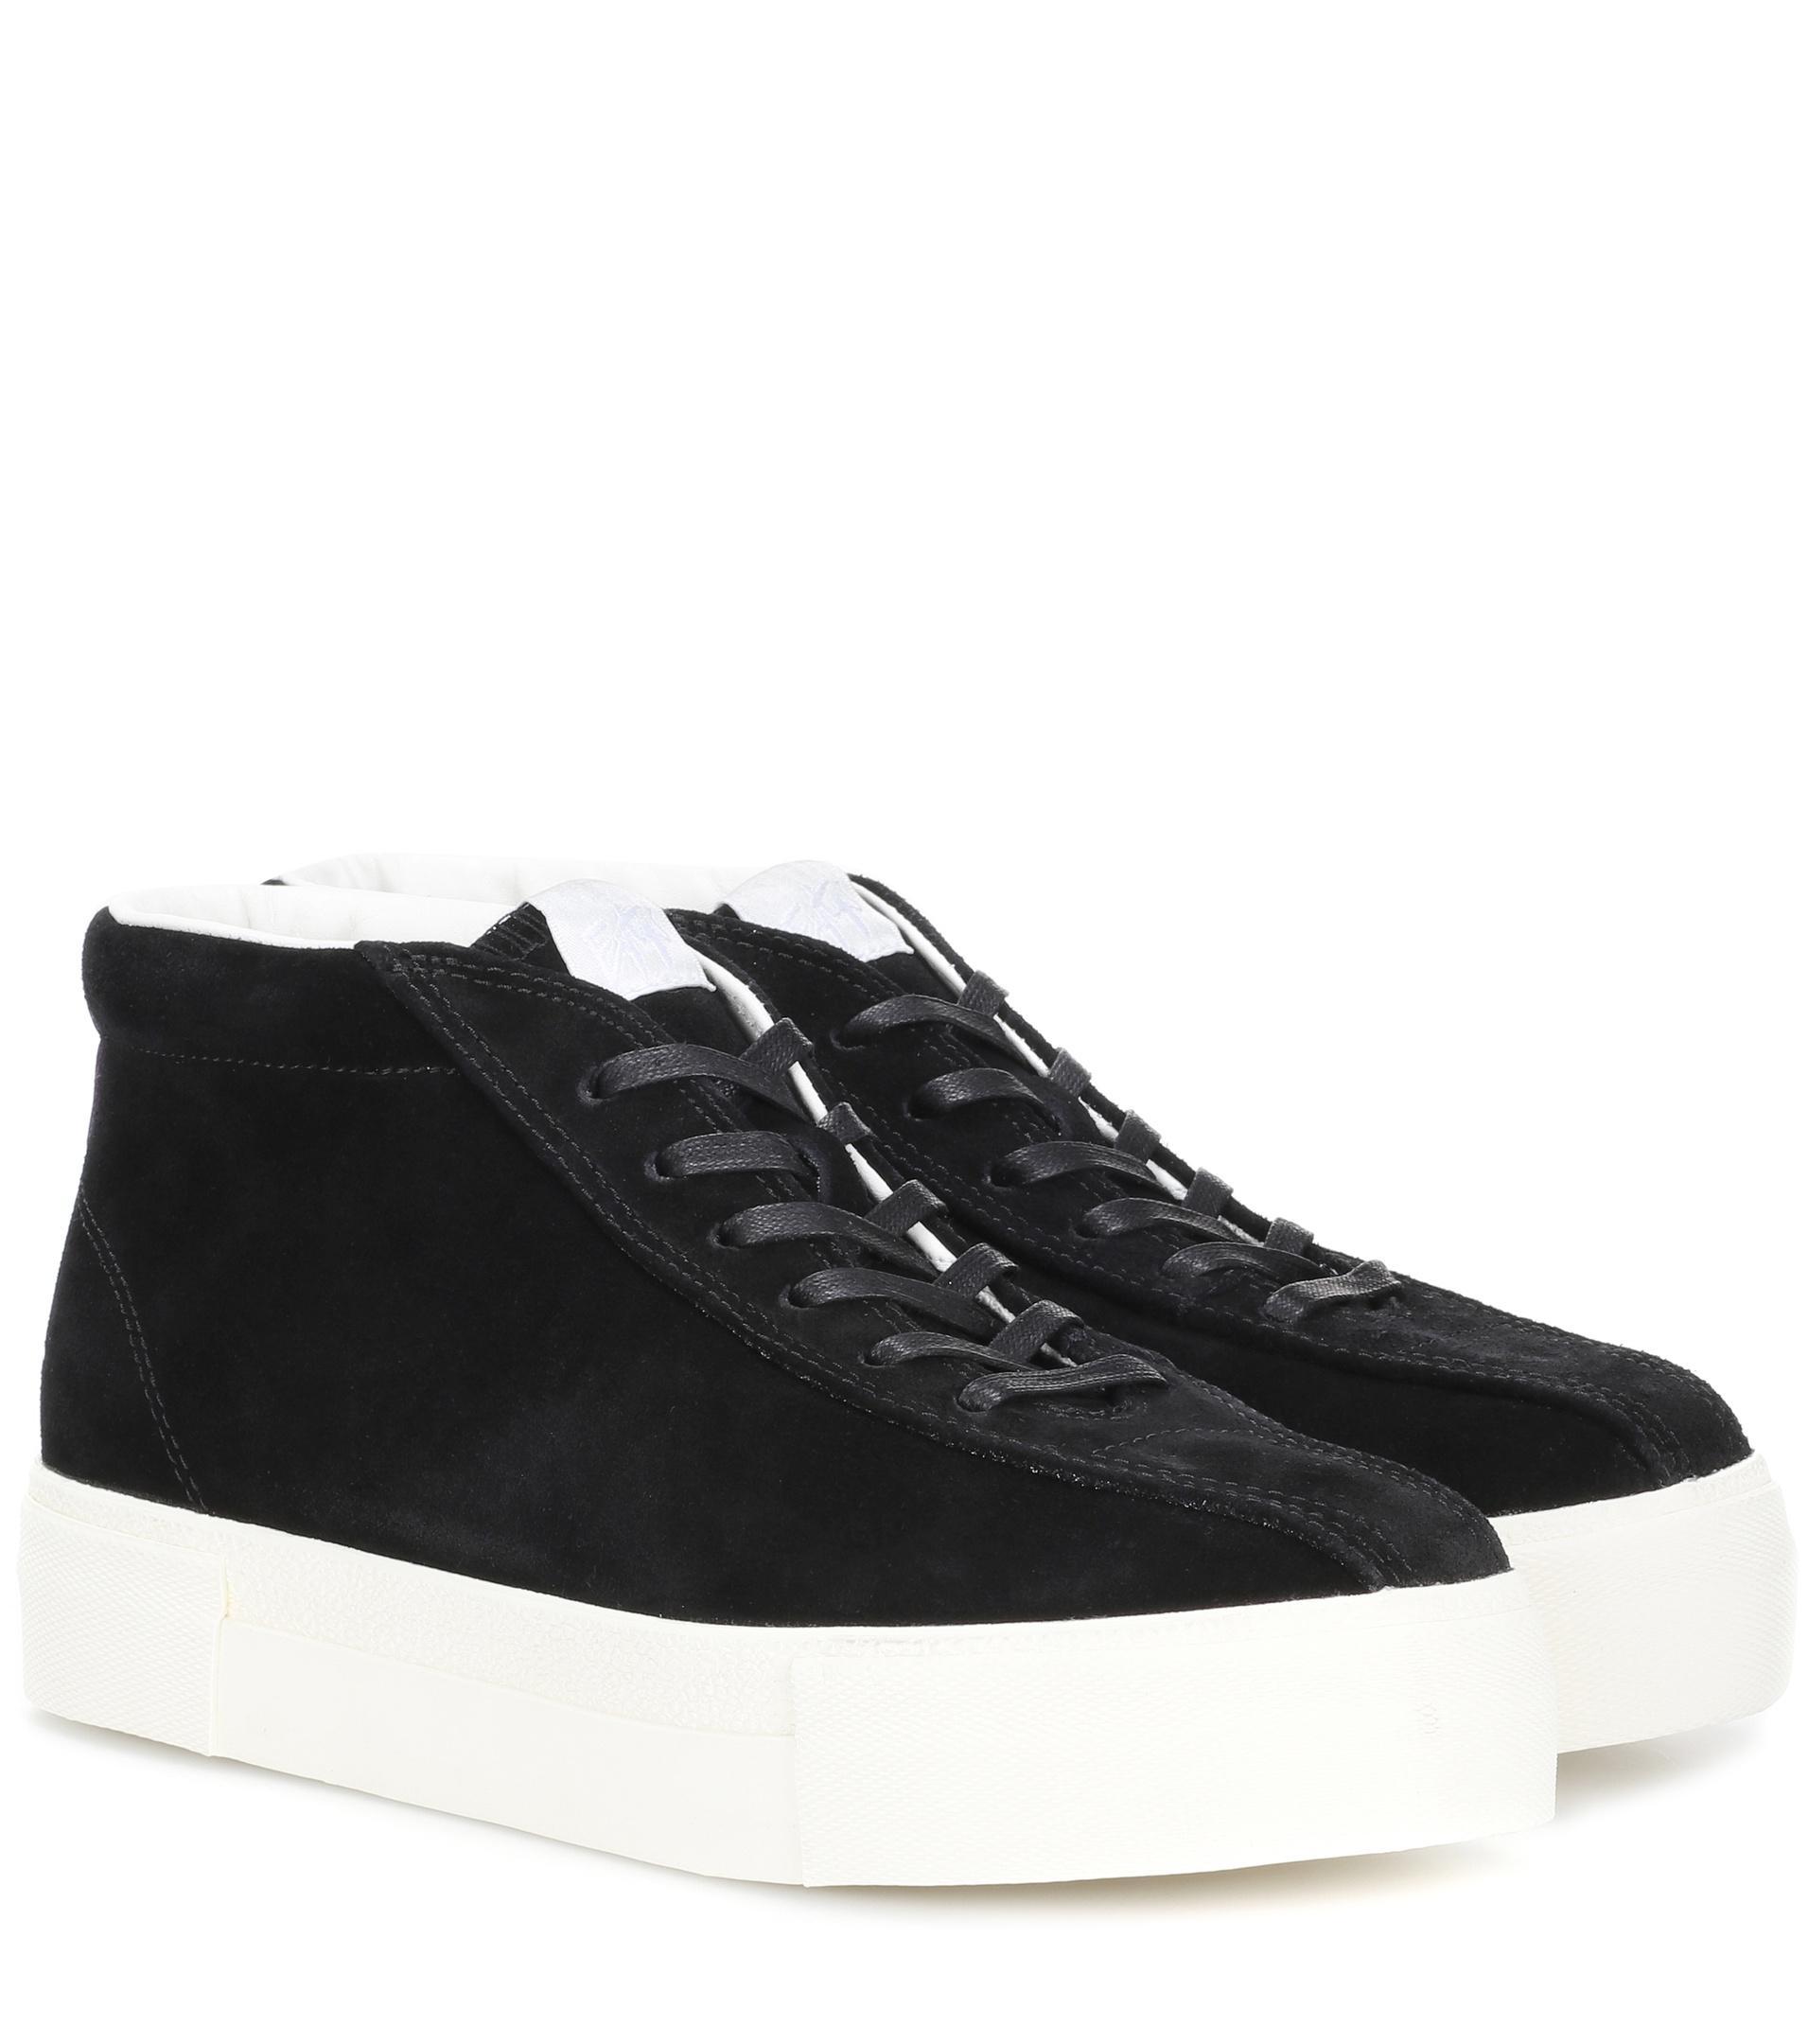 sale ebay Eytys Printed High-Top Sneakers 2014 unisex cheap online genuine for sale FClesFL5u8